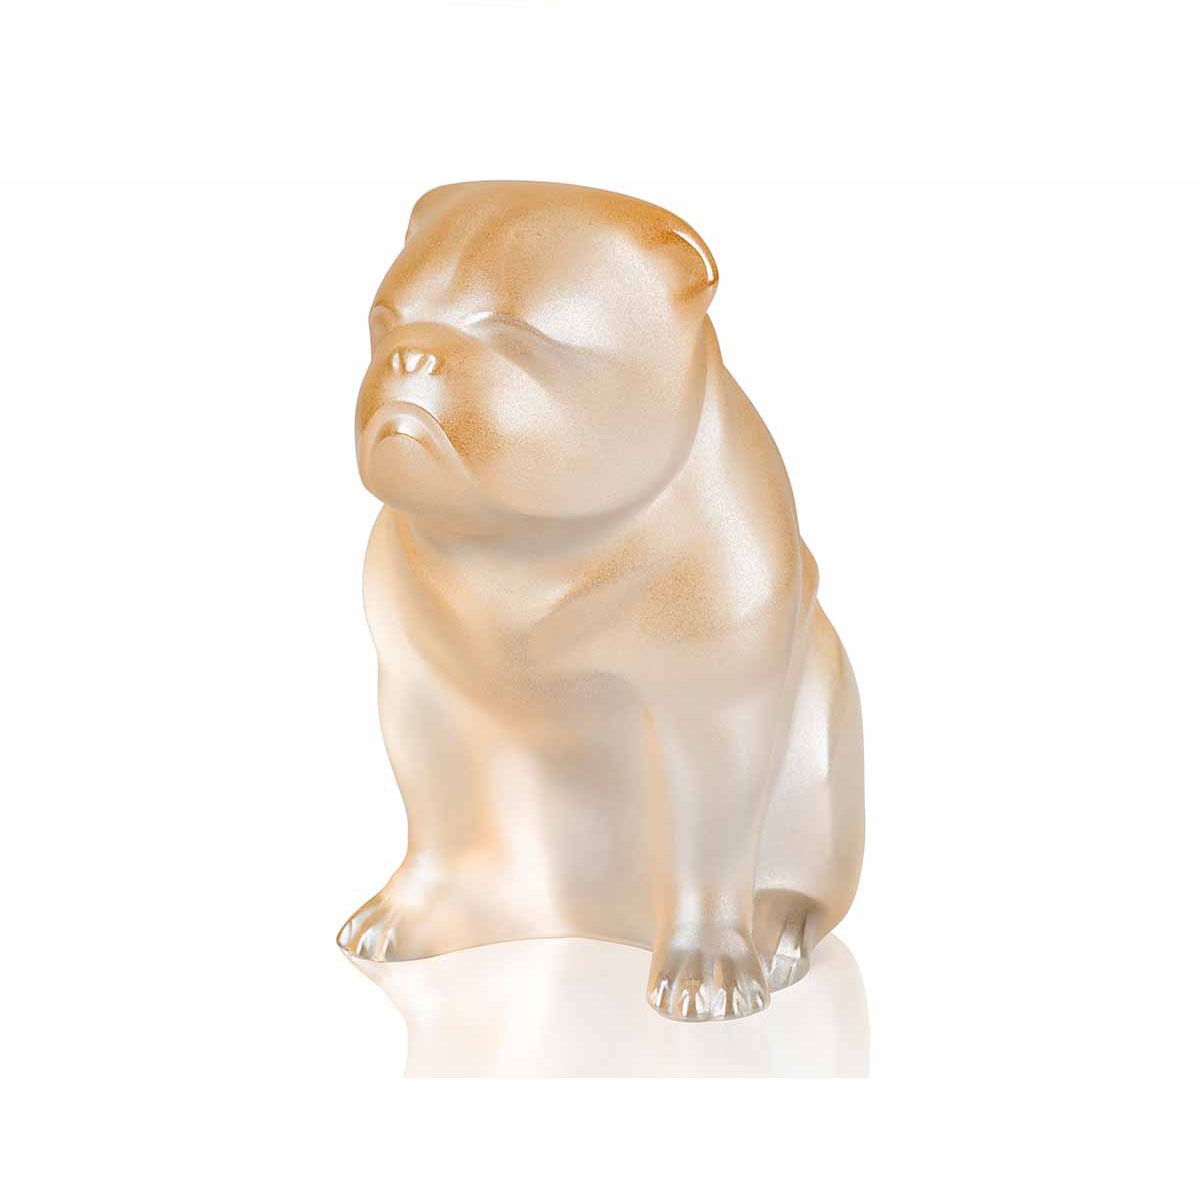 Lalique Crystal, Bulldog Sculpture, Gold Luster